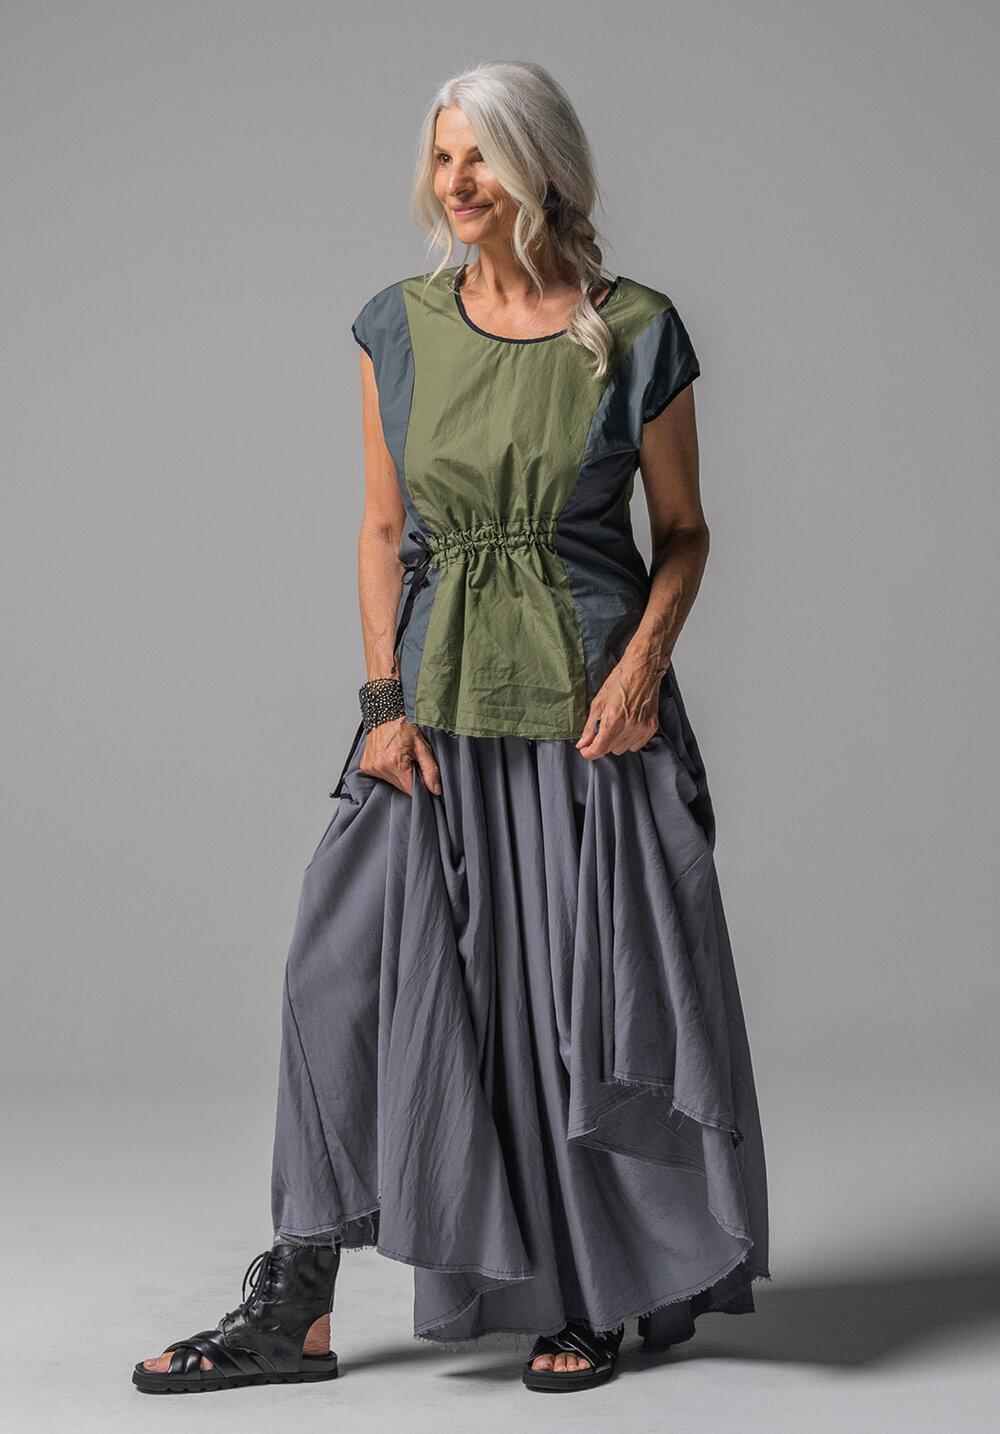 Ghost top + Fade maxi skirt